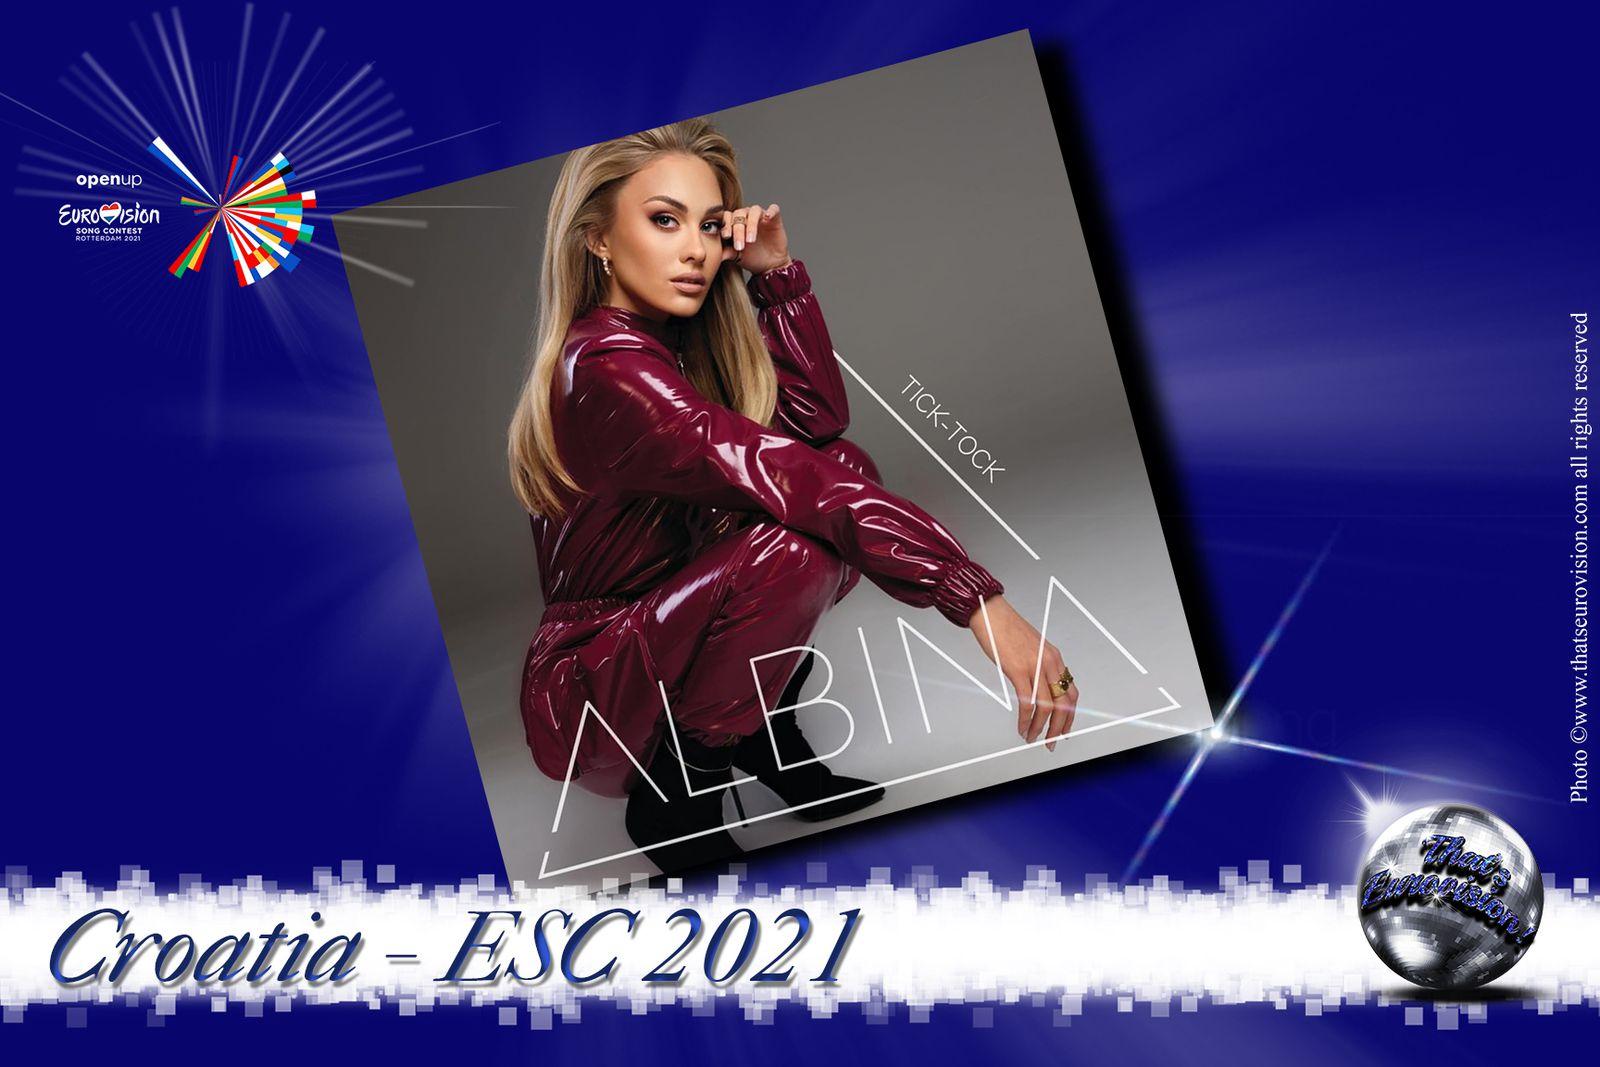 Croatia 2021 - Albina (Tick-Tock)